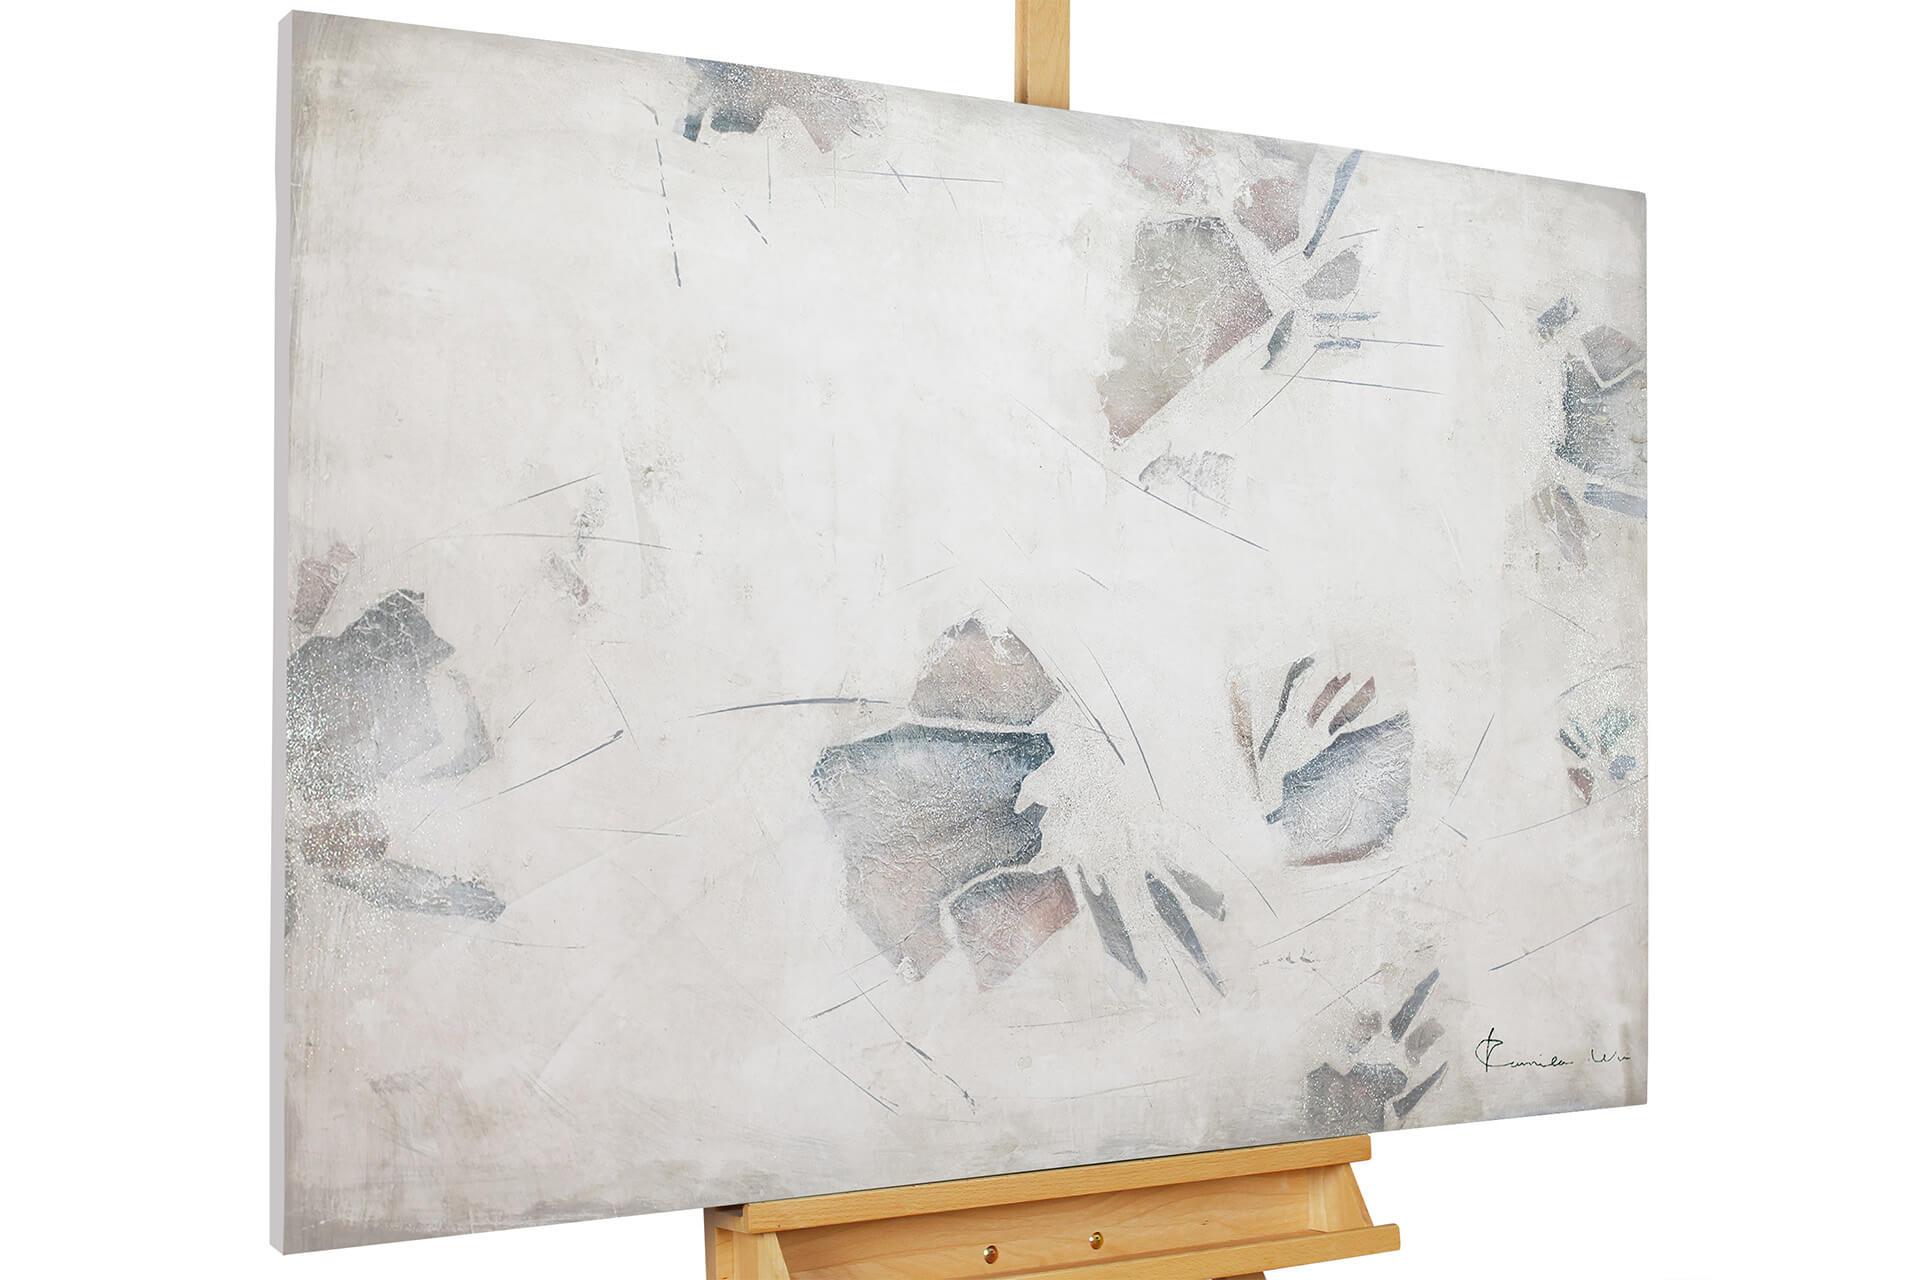 KL abstrakt spuren grau beige acryl gemaelde acryl bilder leinwandbilder moderne kunst 01